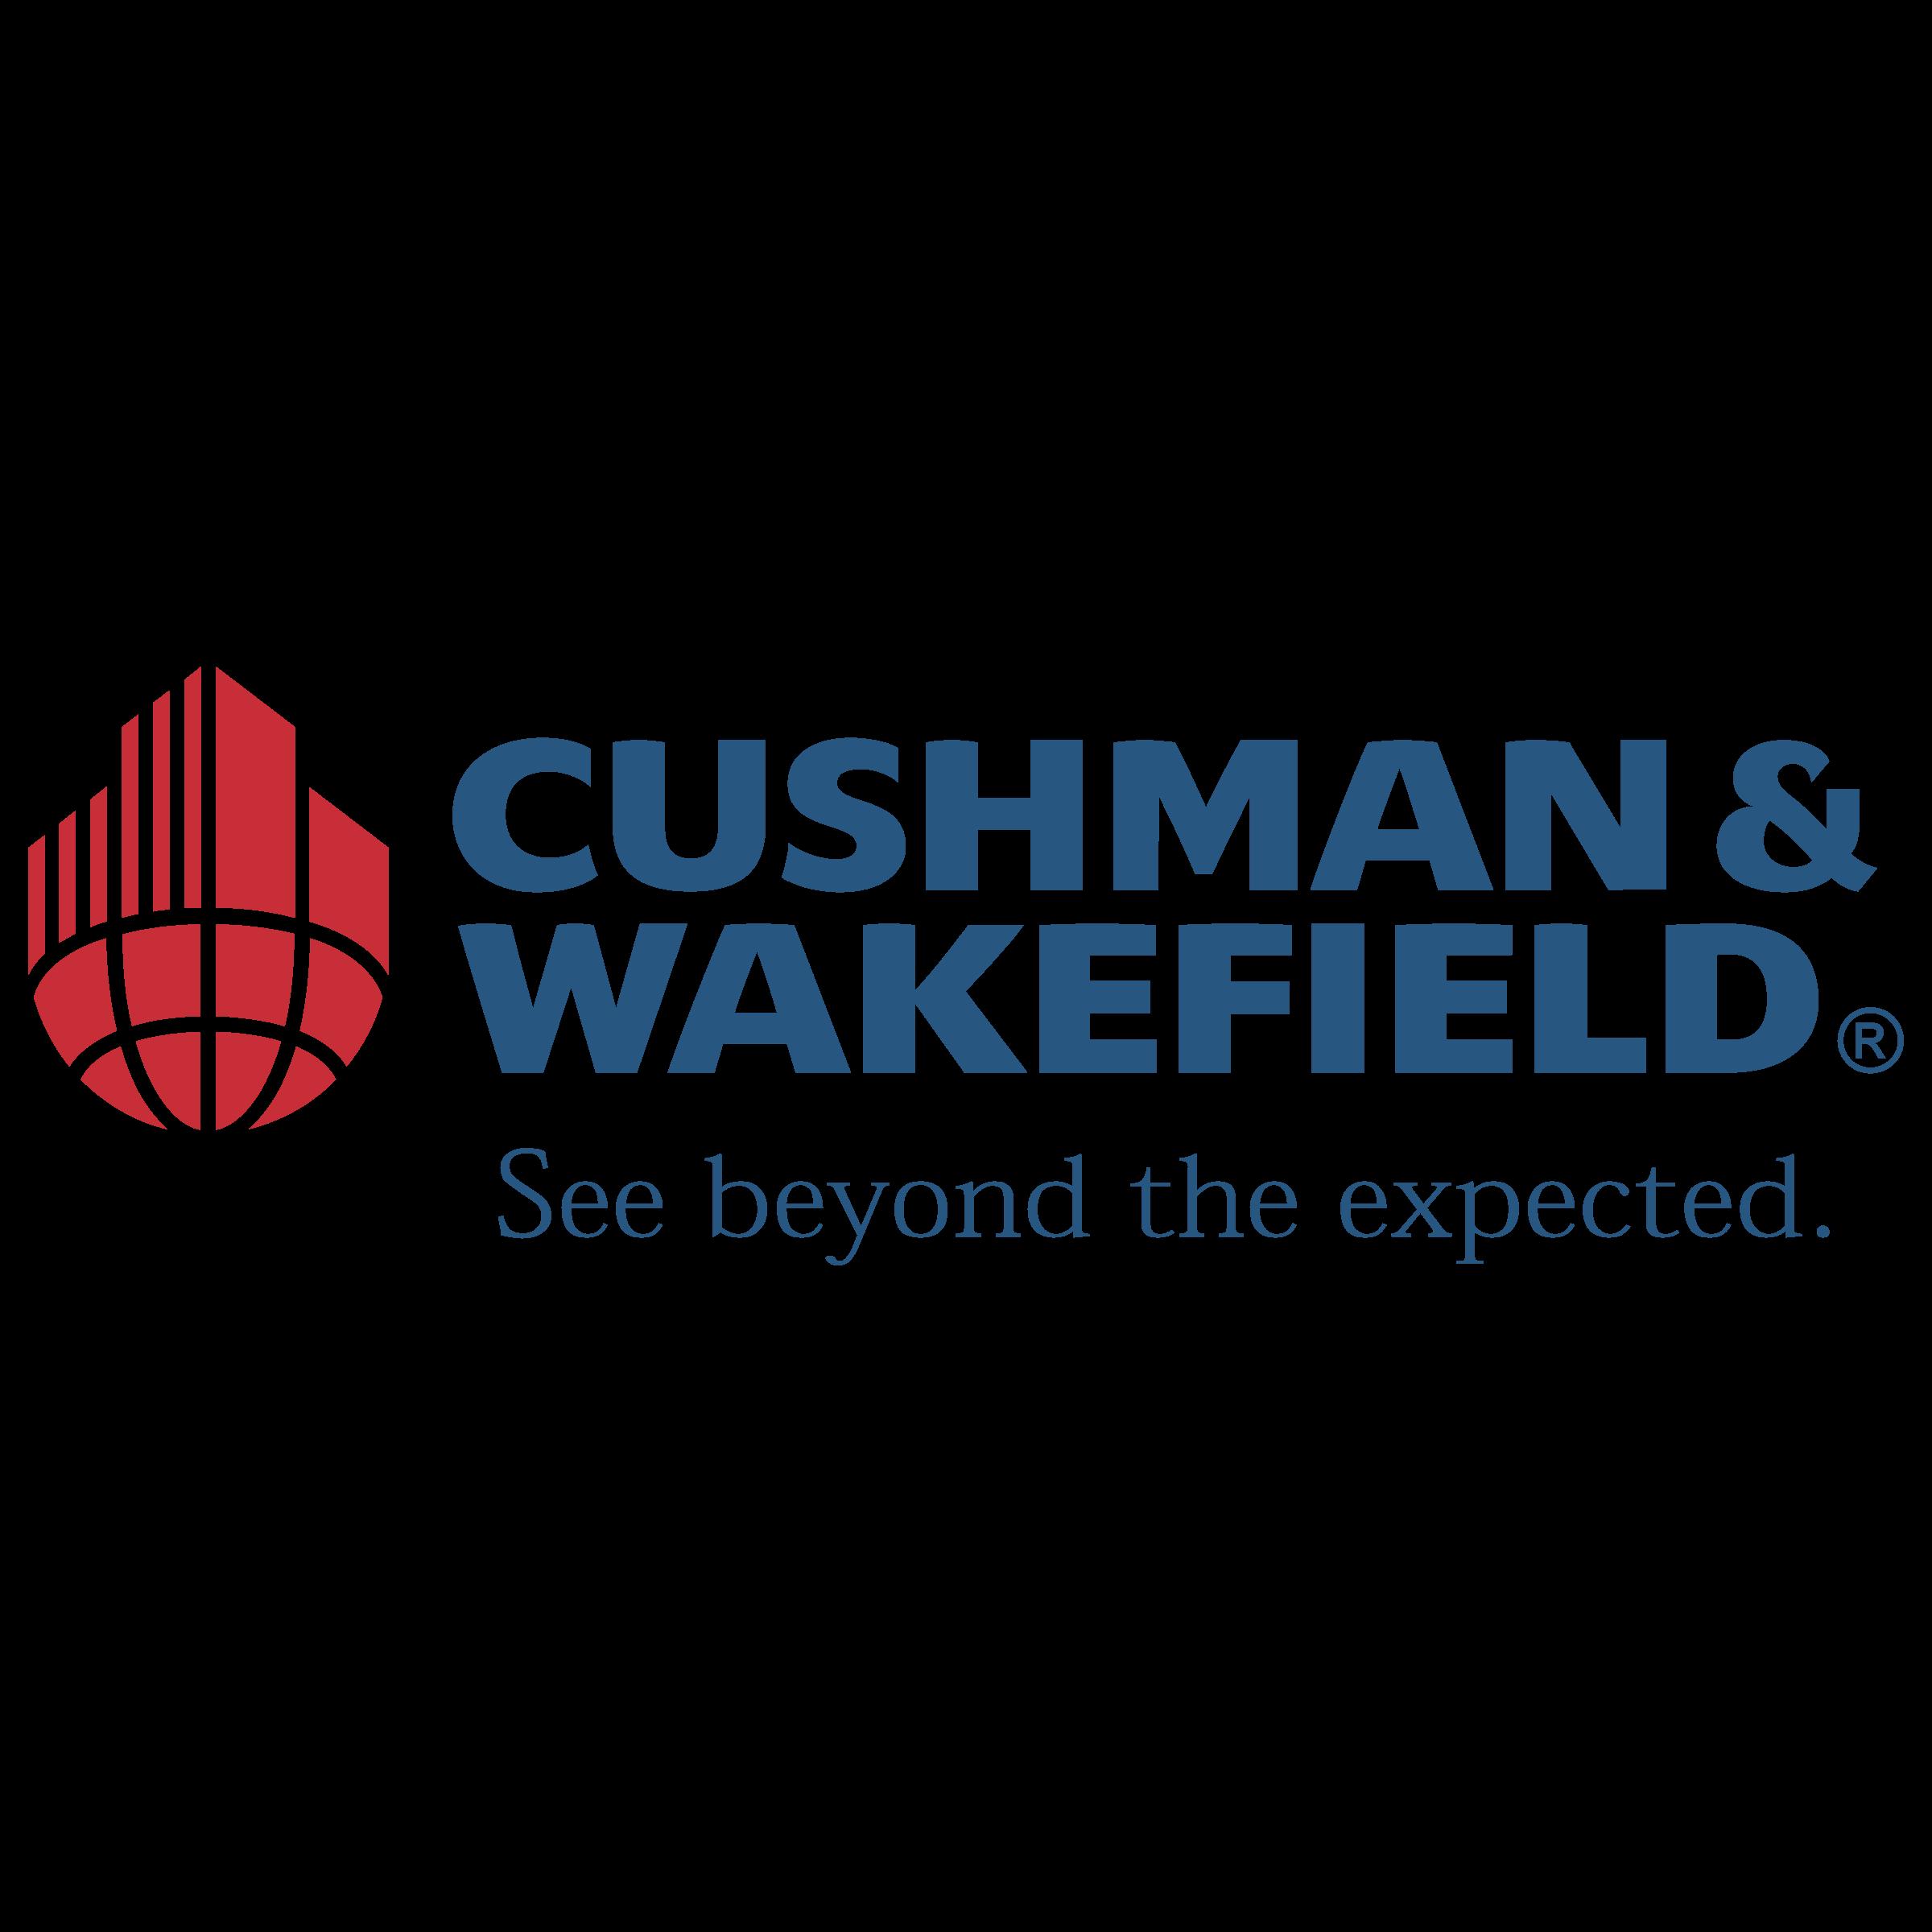 Cushman & Wakefield Logo PNG Transparent & SVG Vector.